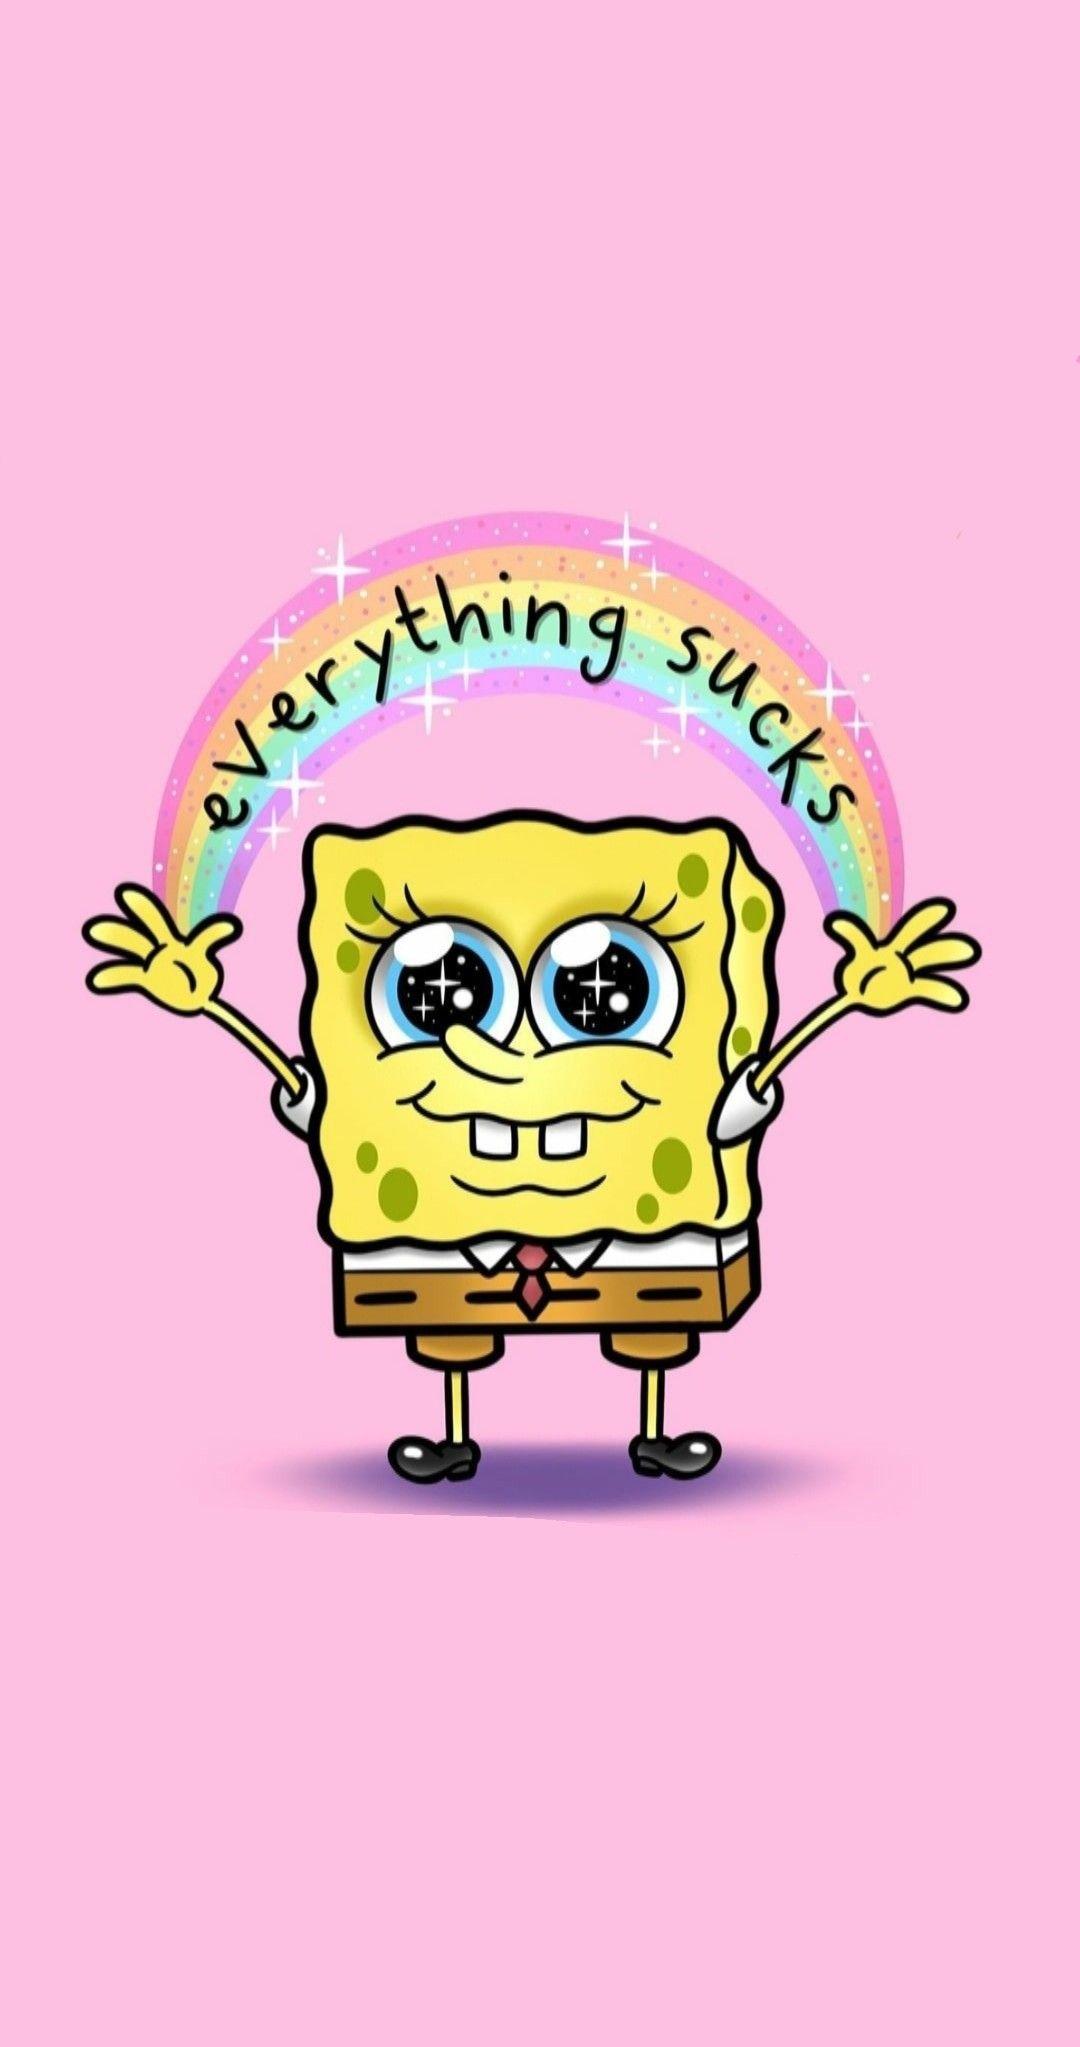 Cute Pink Spongebob Wallpaper Spongebob Wallpaper Spongebob Spongebob Memes